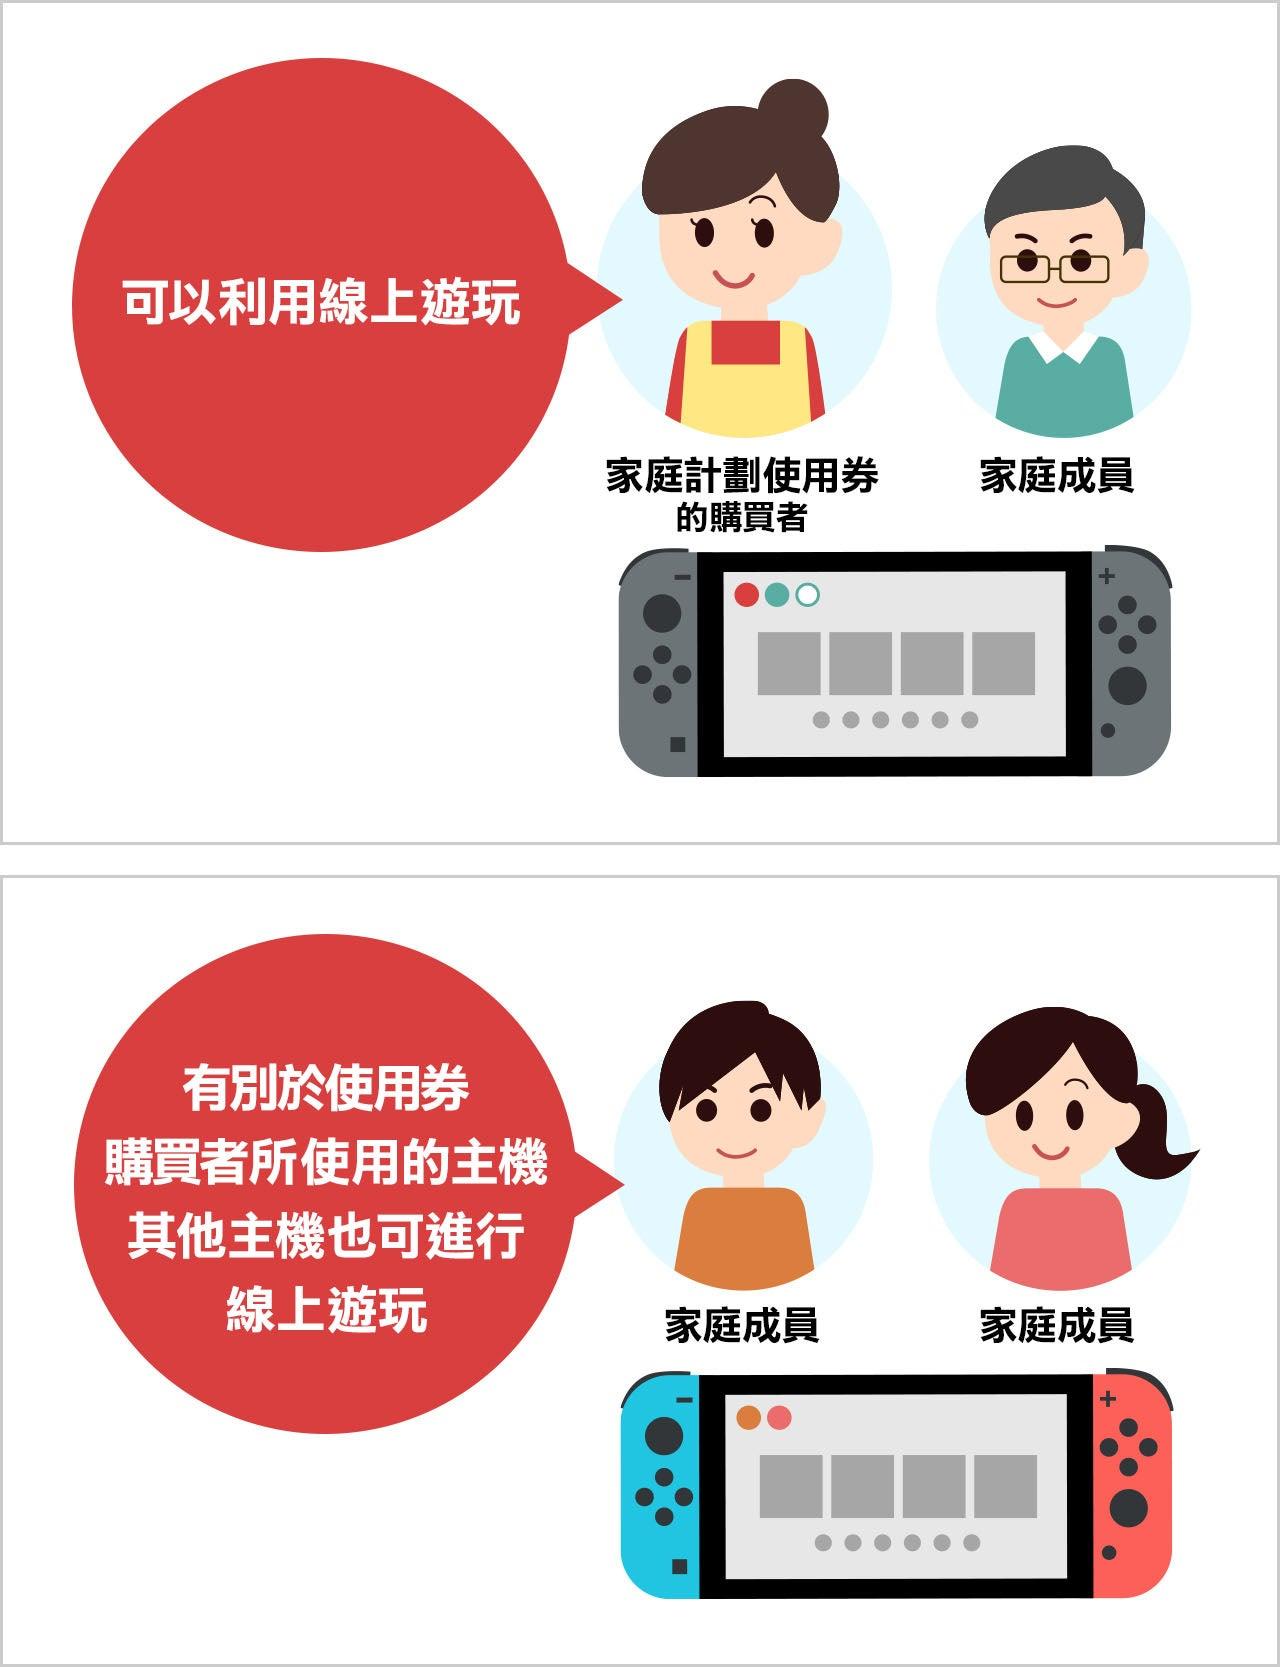 計劃內容 Nintendo Switch Online支援 Nintendo